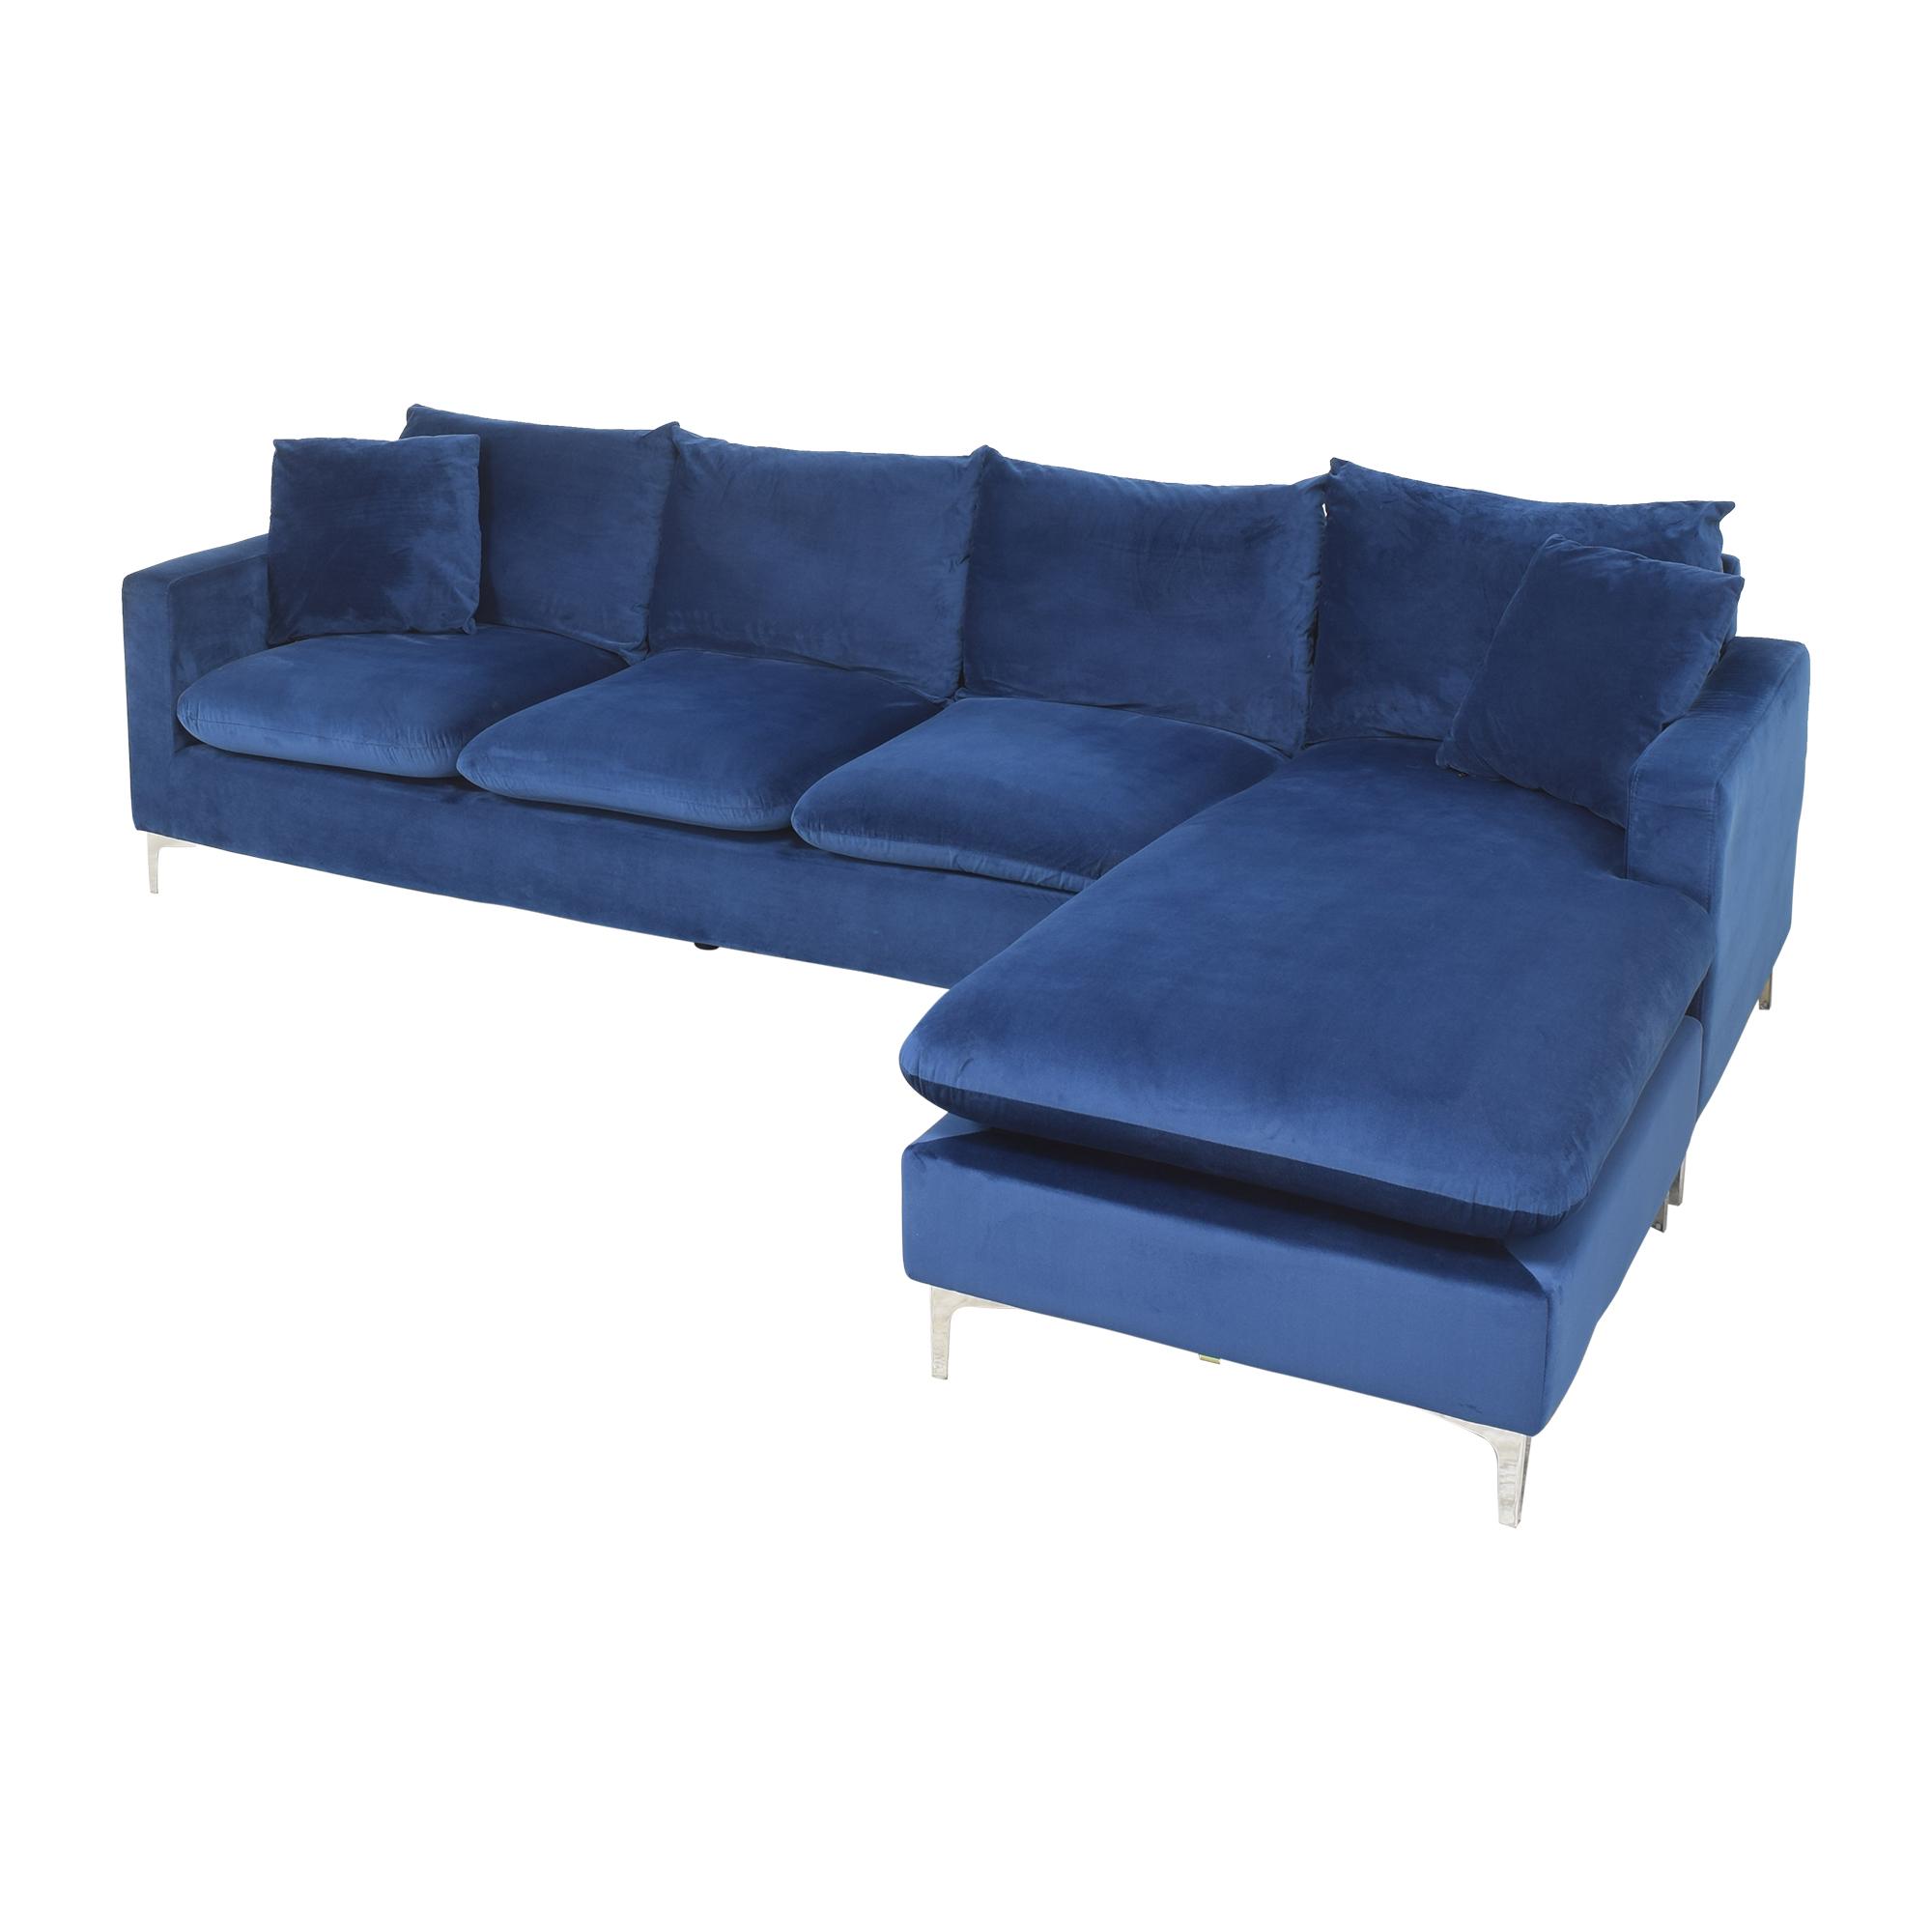 Wayfair Wayfair Boutwell Reversible Sectional Sofa pa